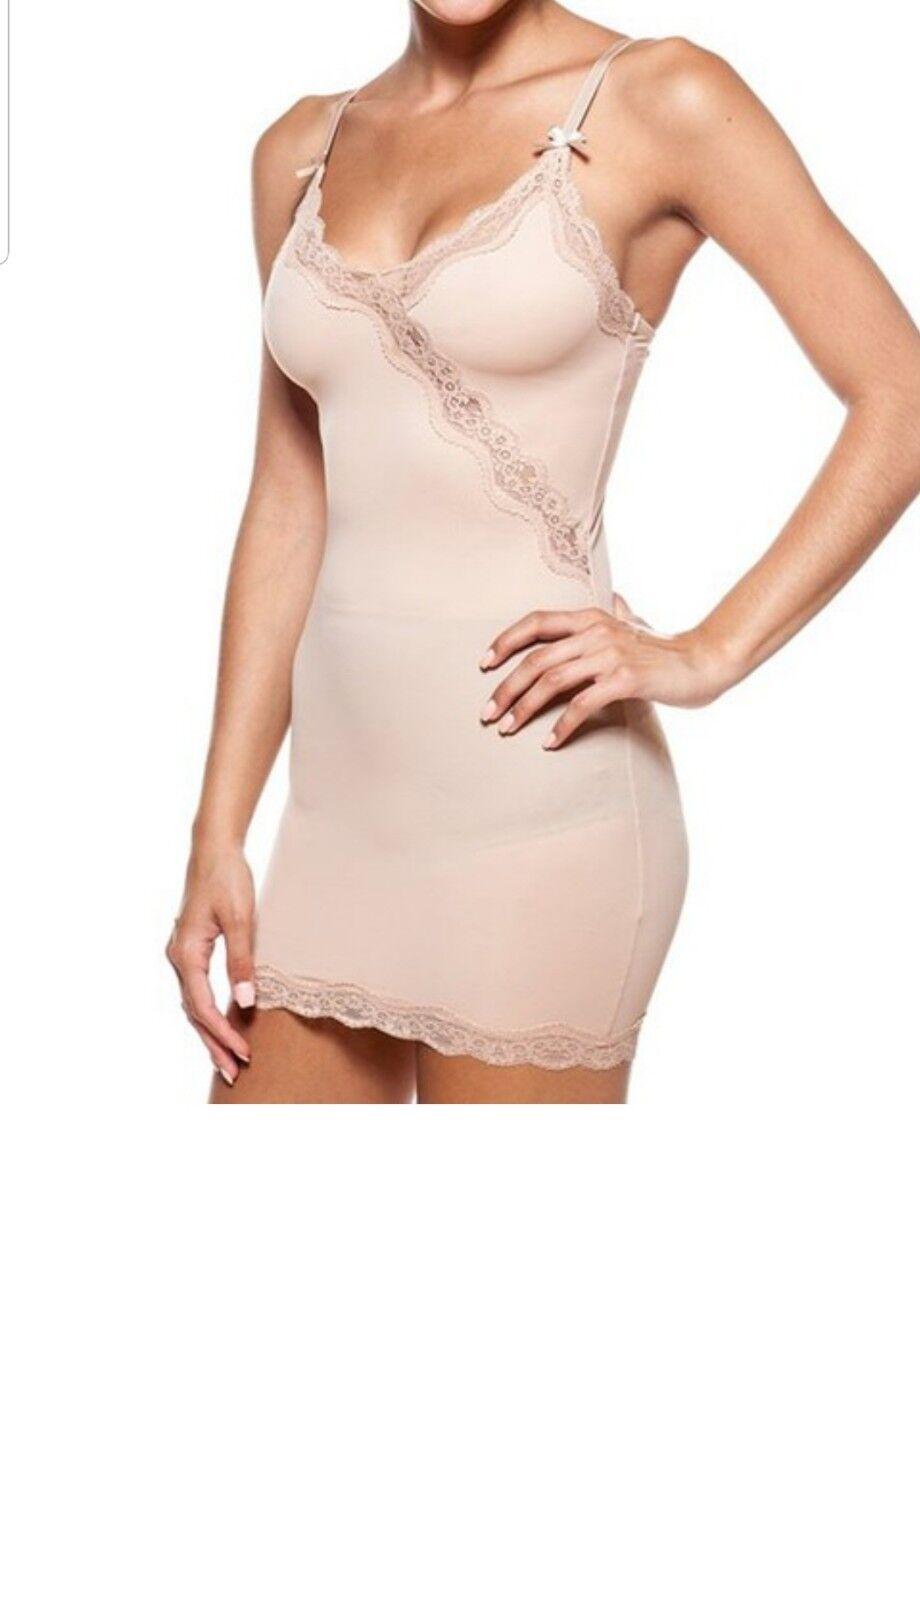 27297f291b26 Body Beautiful Nude Lace-Trim Moderate Compression Shaper Slip Sz 3X NEW